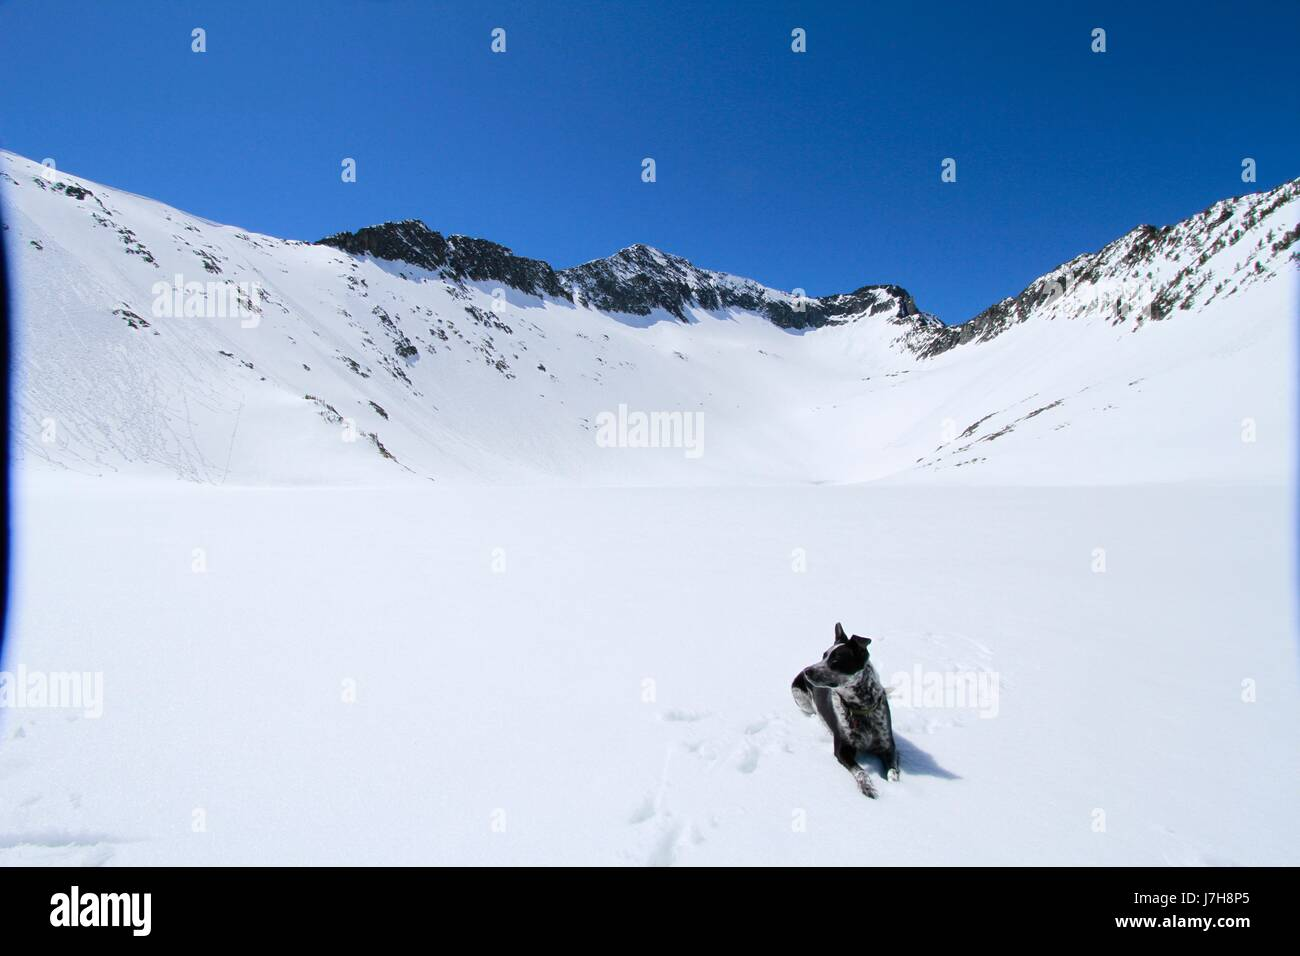 Crazy Mountains with snow, Montana - Stock Image